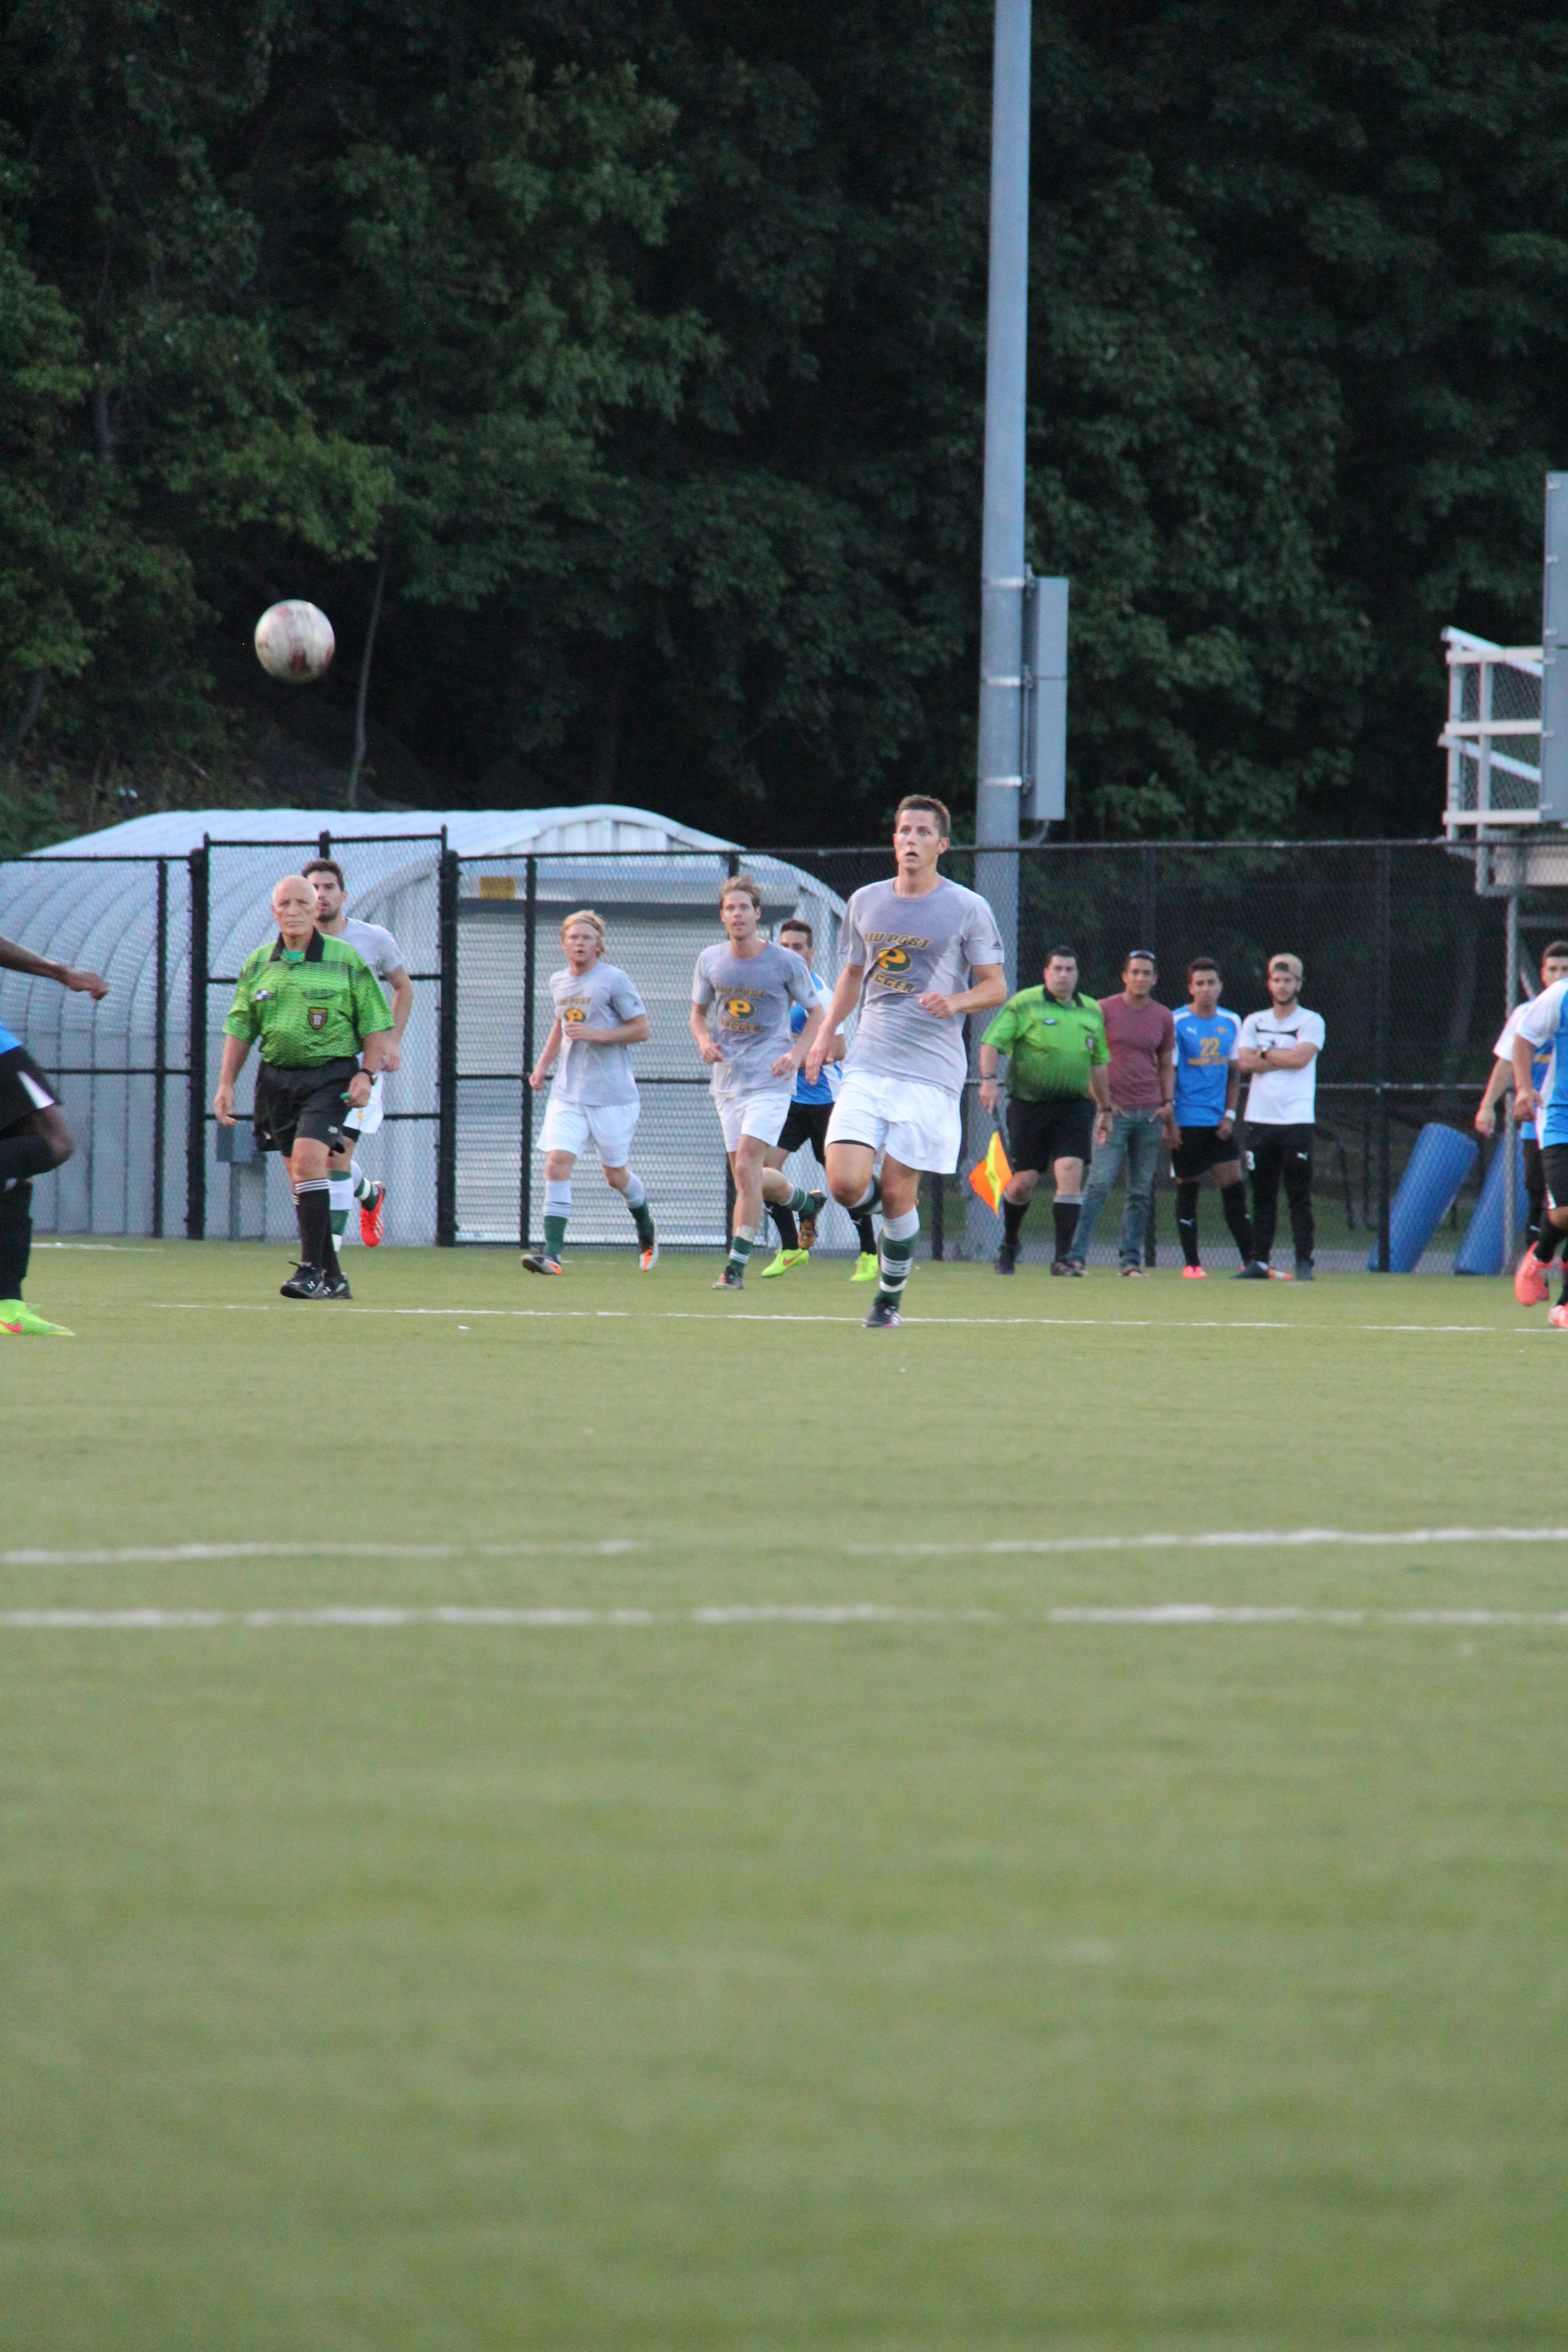 Captain Eivind Austboe of the LIU Post men's soccer team